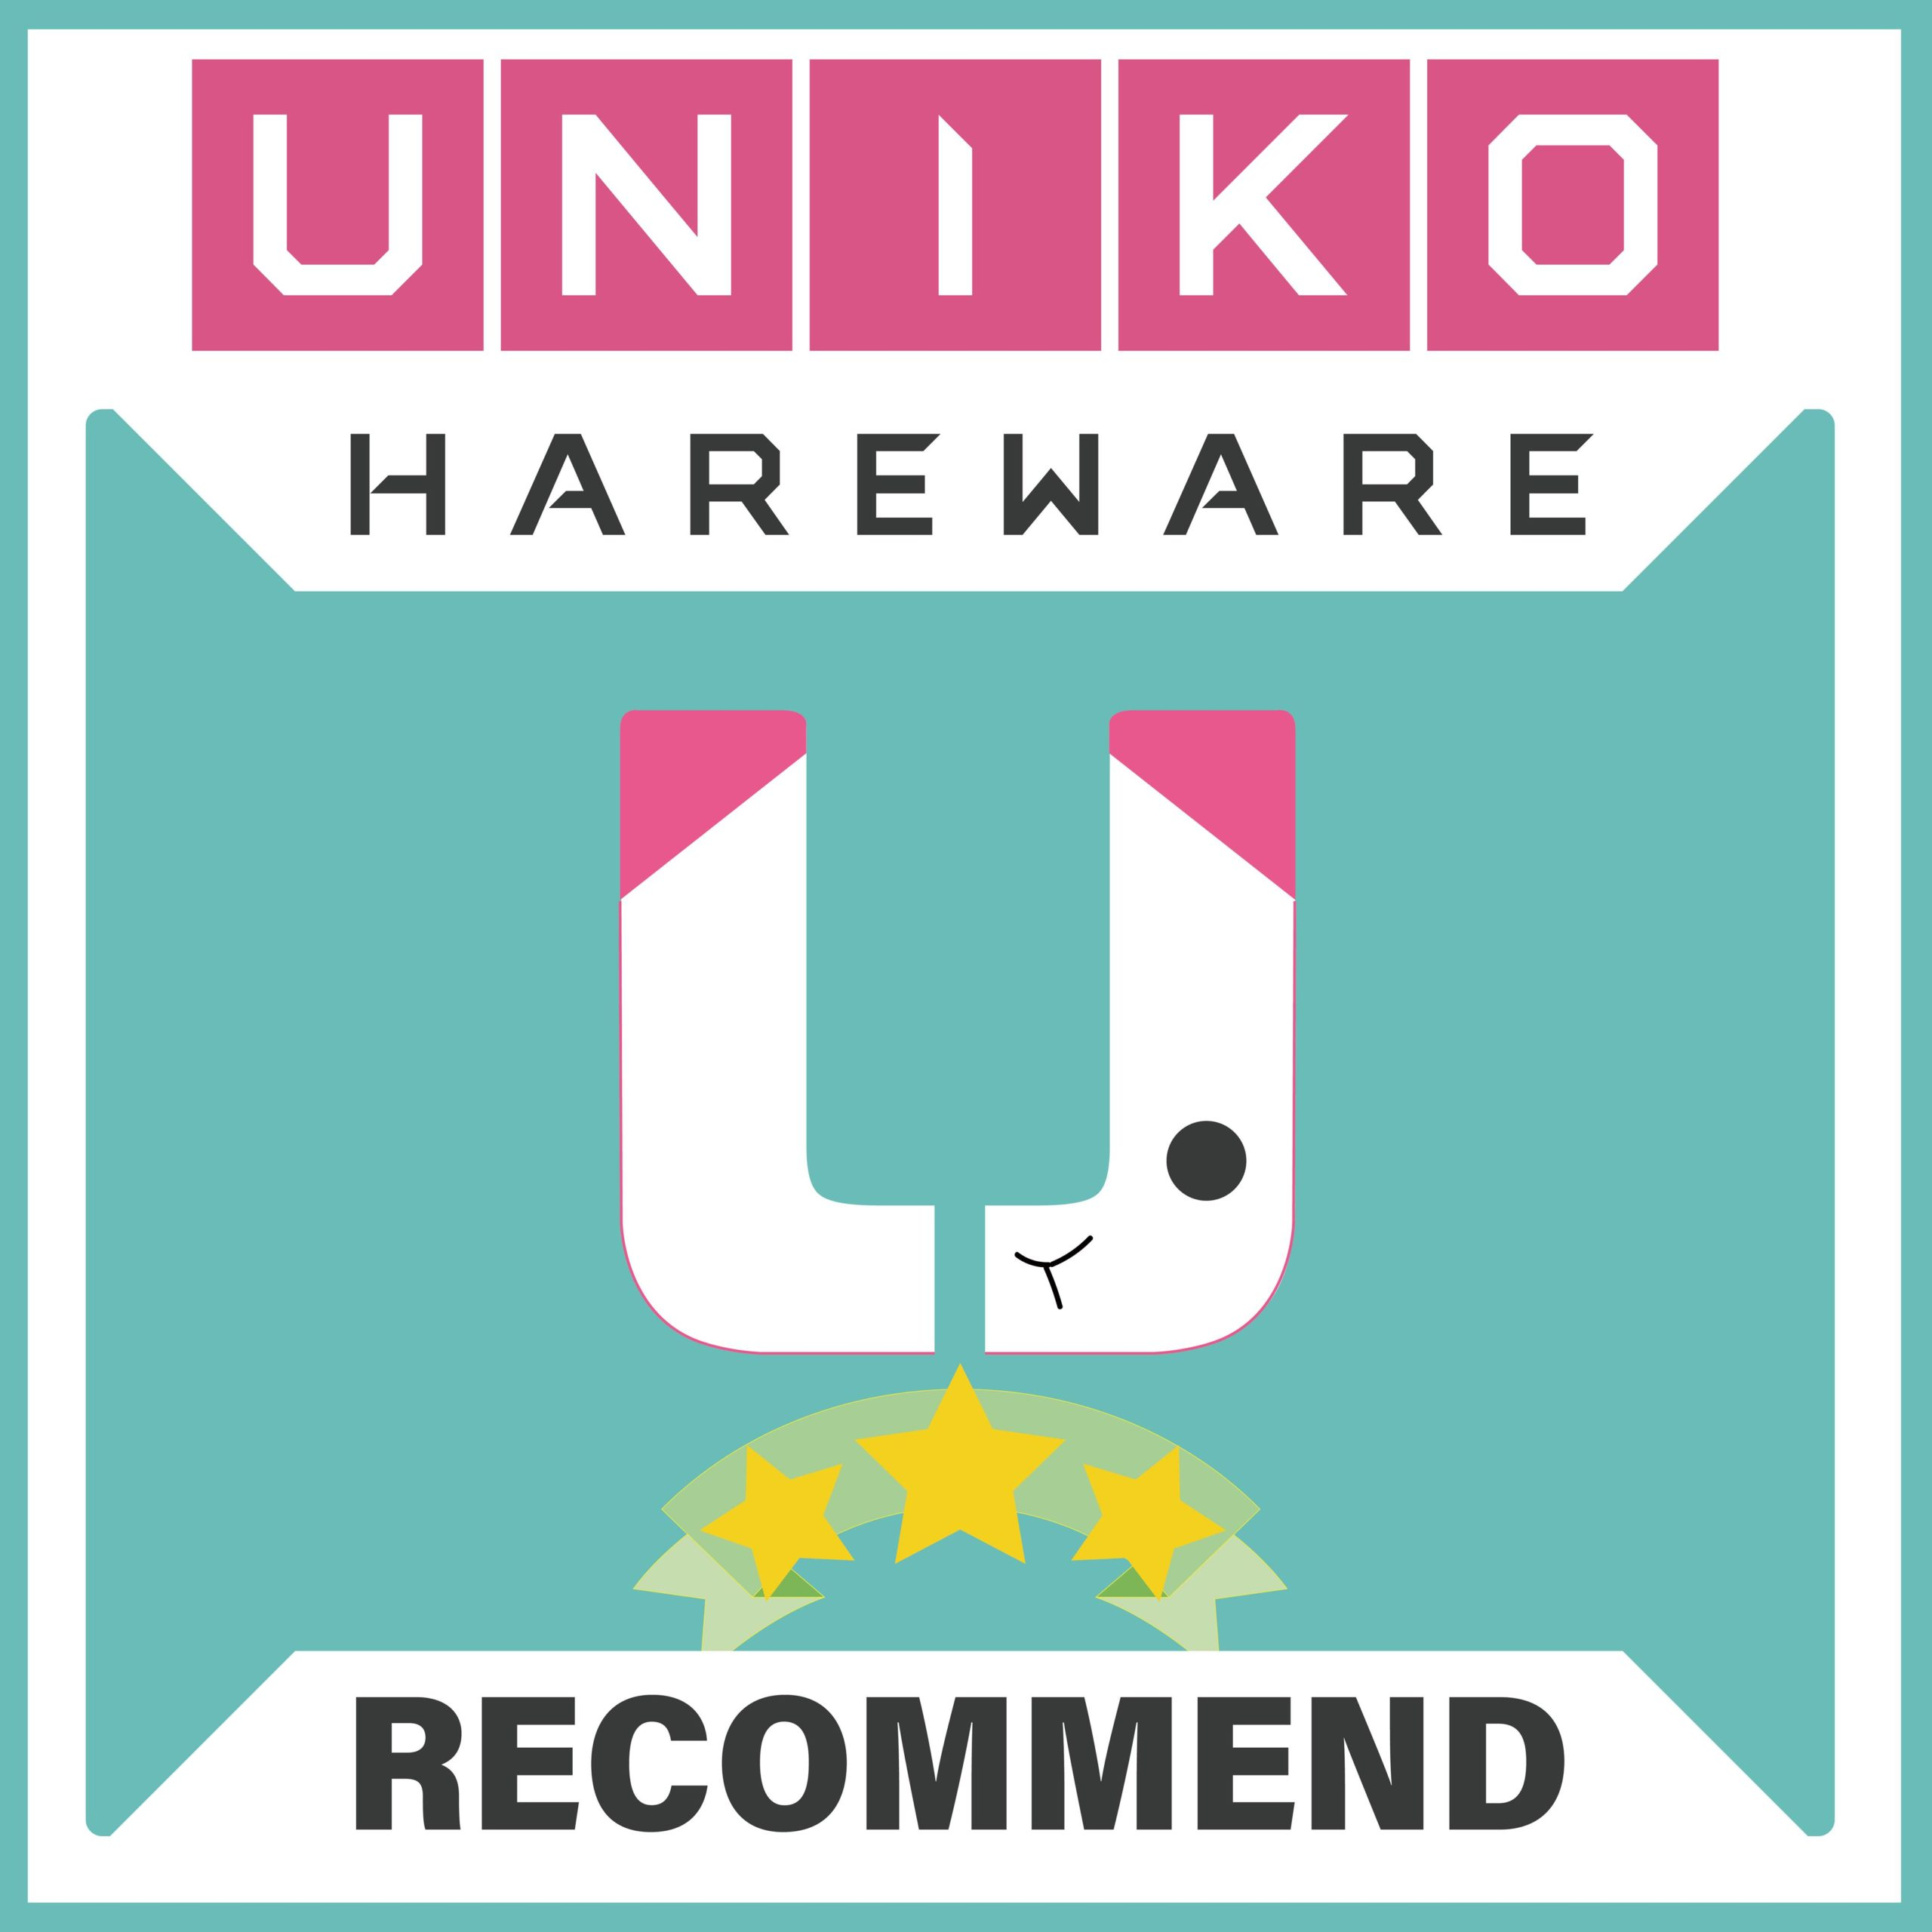 UNIKO's Hardware 推薦大家購買 Antec DF600 FLUX